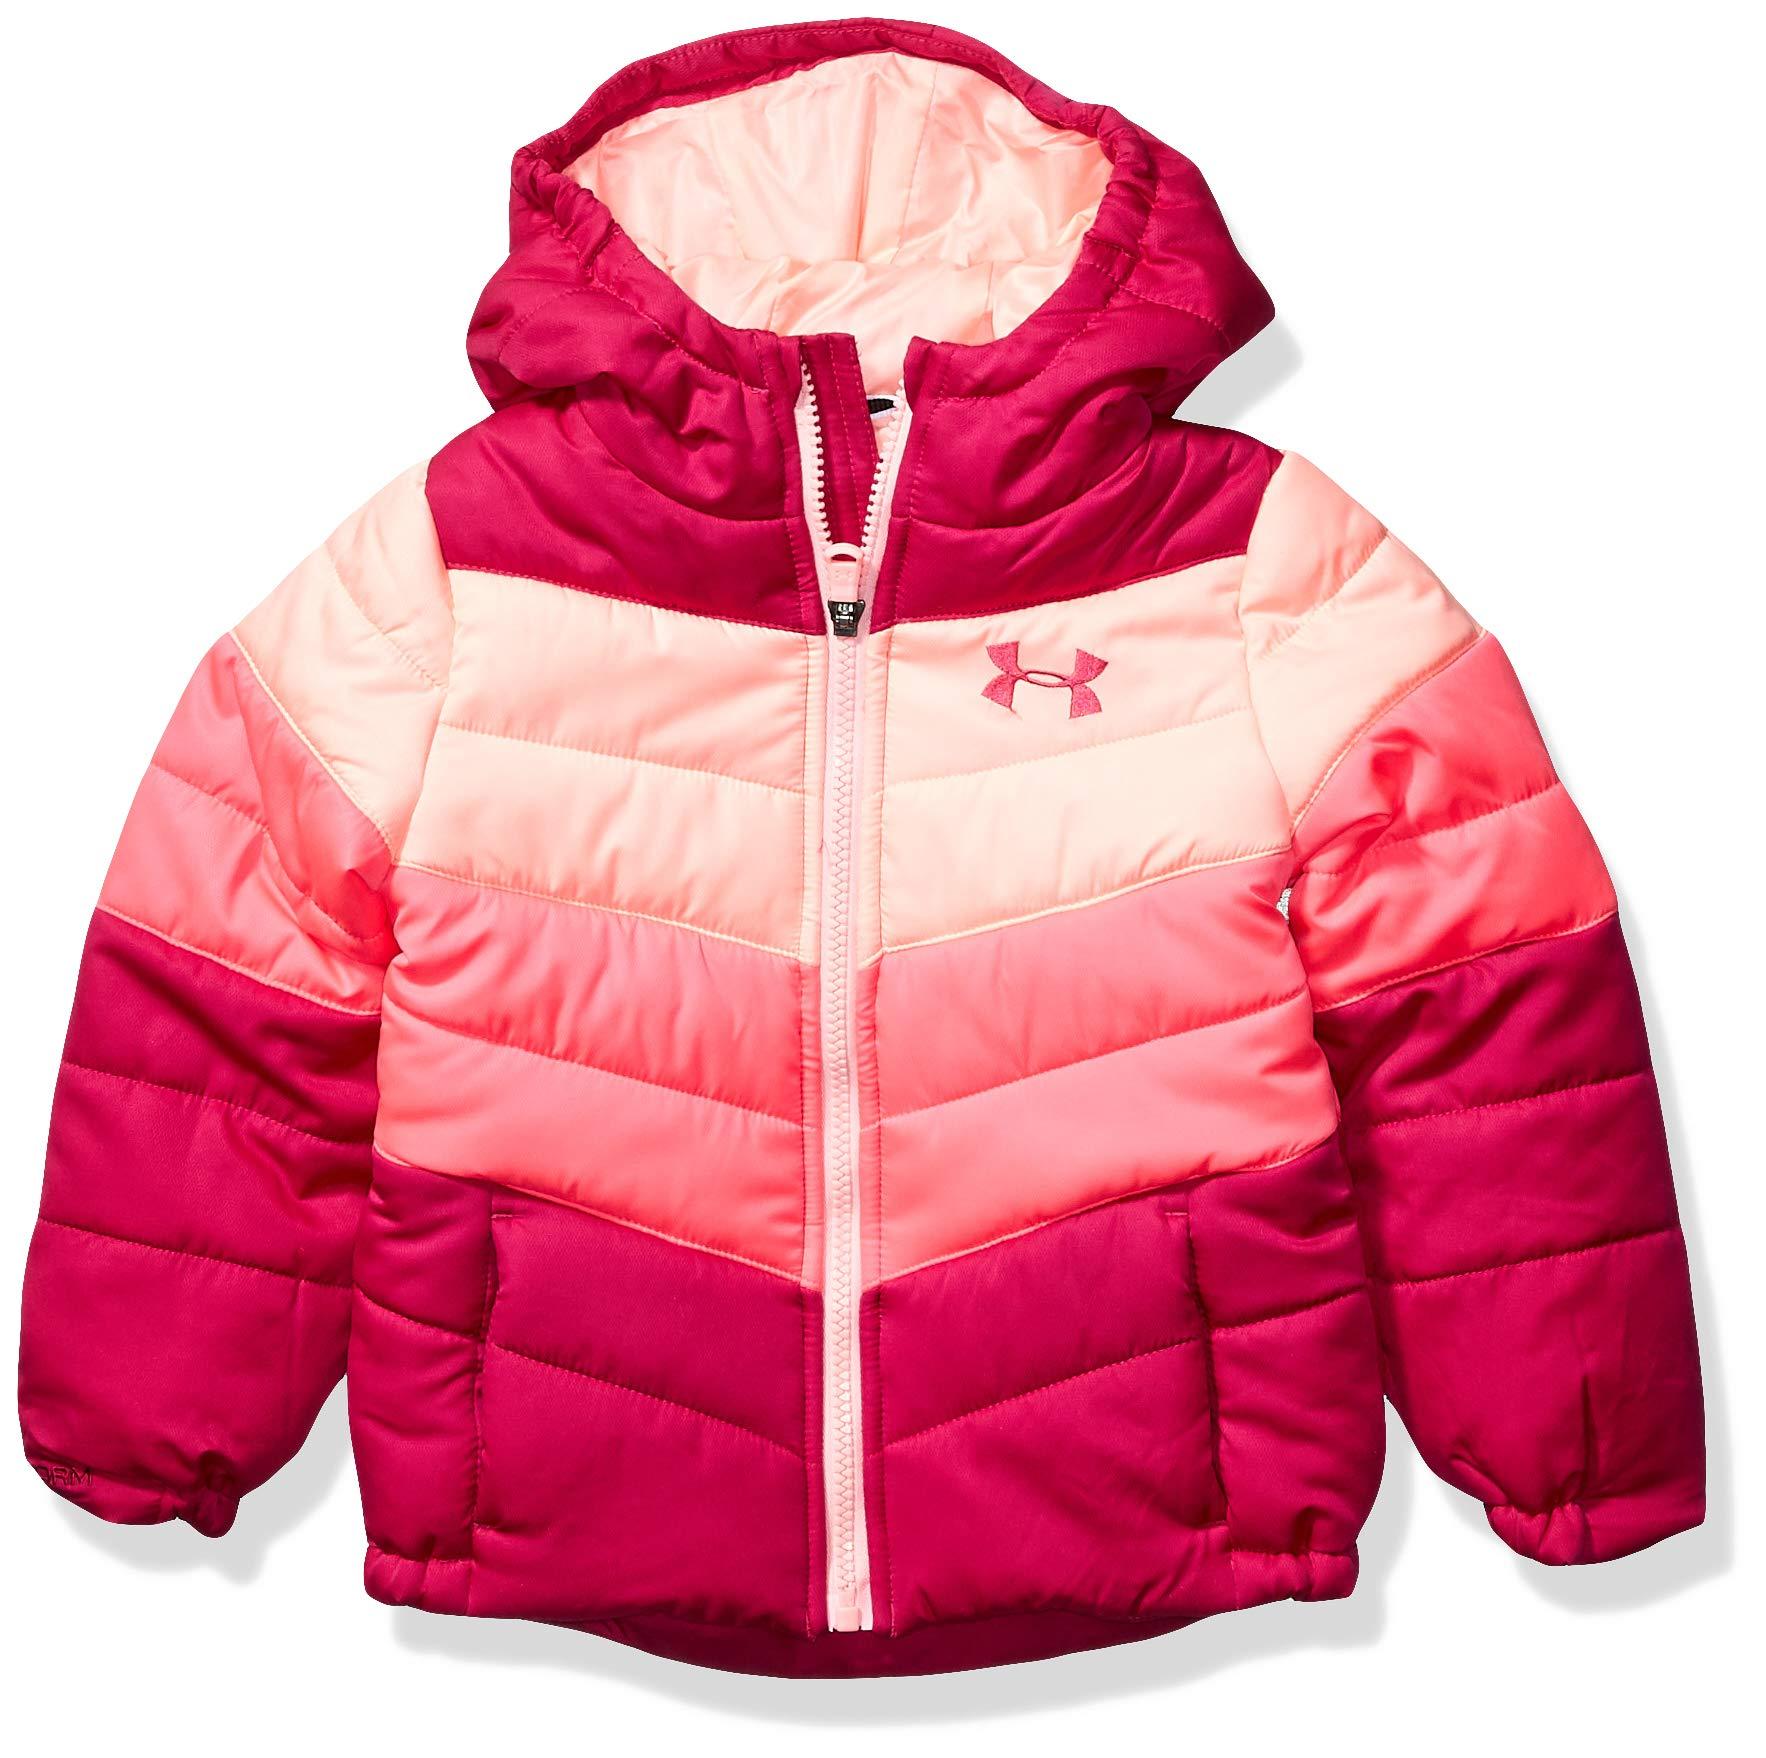 Under Armour Girls' Big ColdGear Prime Puffer Jacket, Rhubarb F, YMD by Under Armour